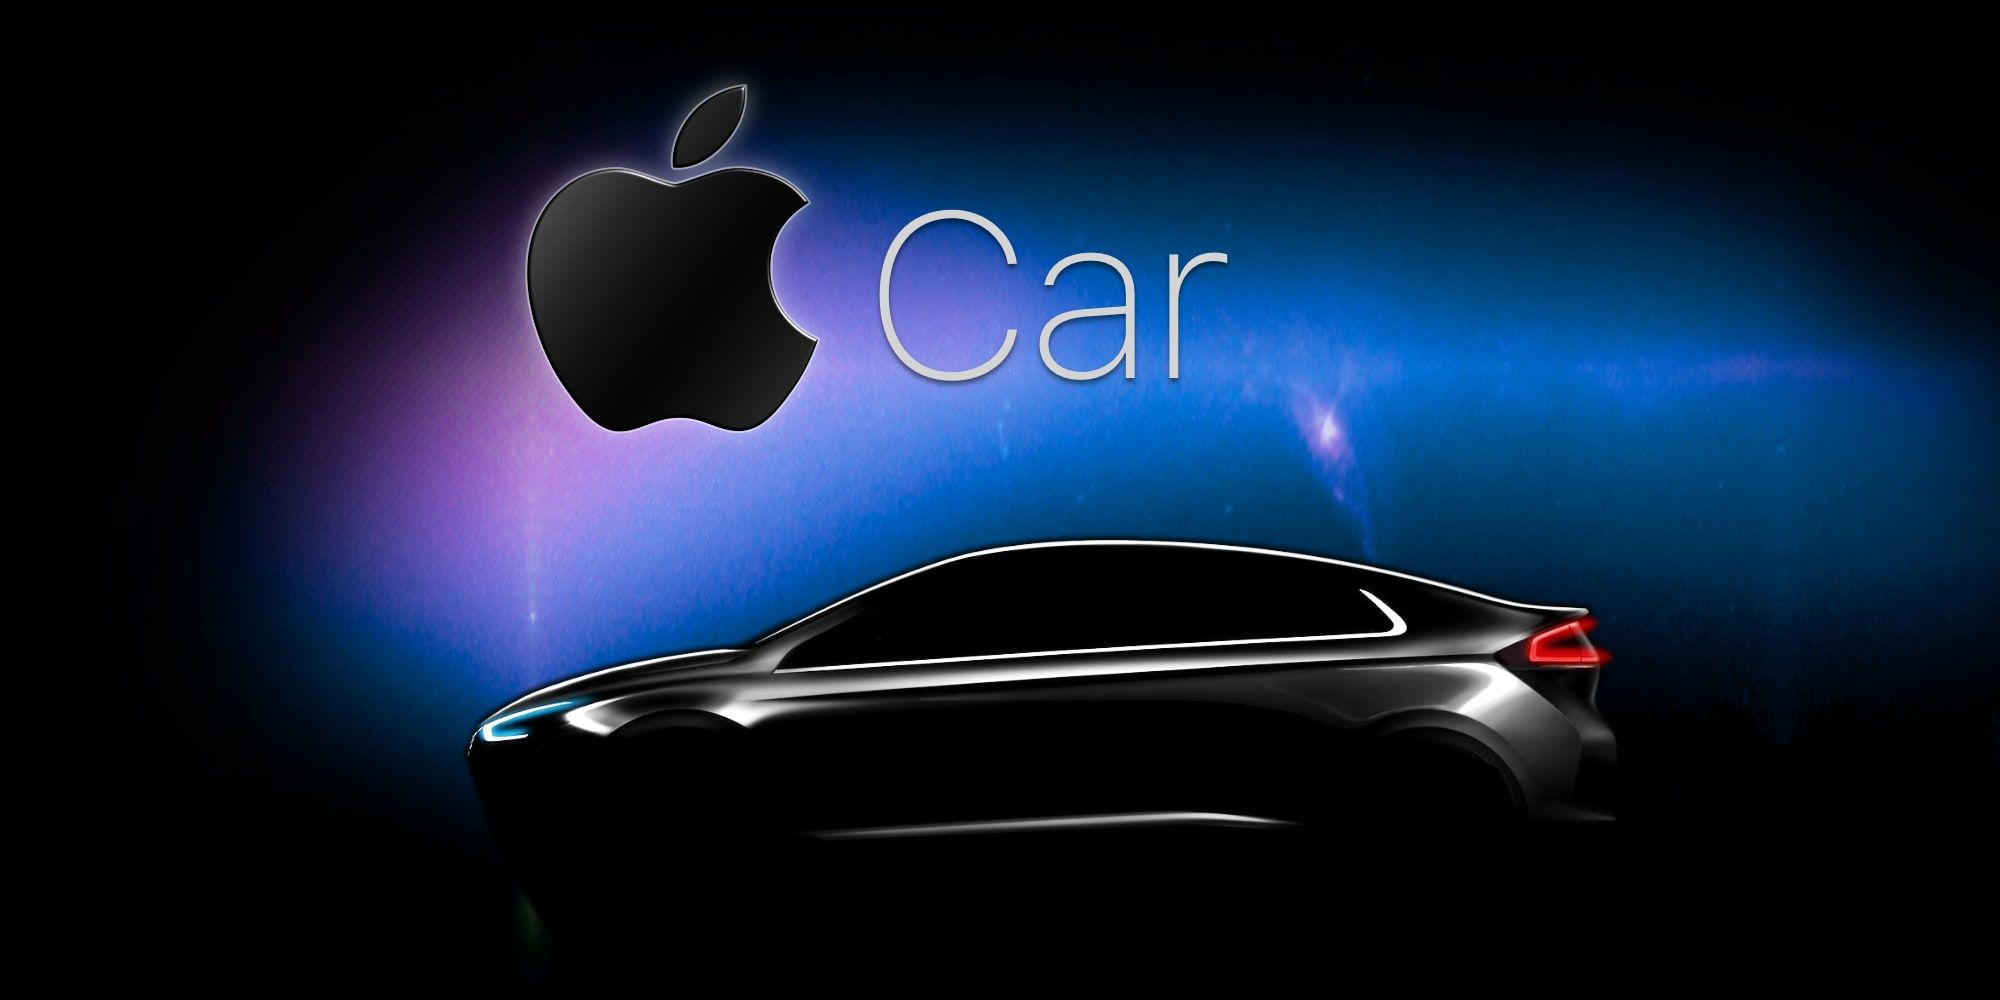 Car apple